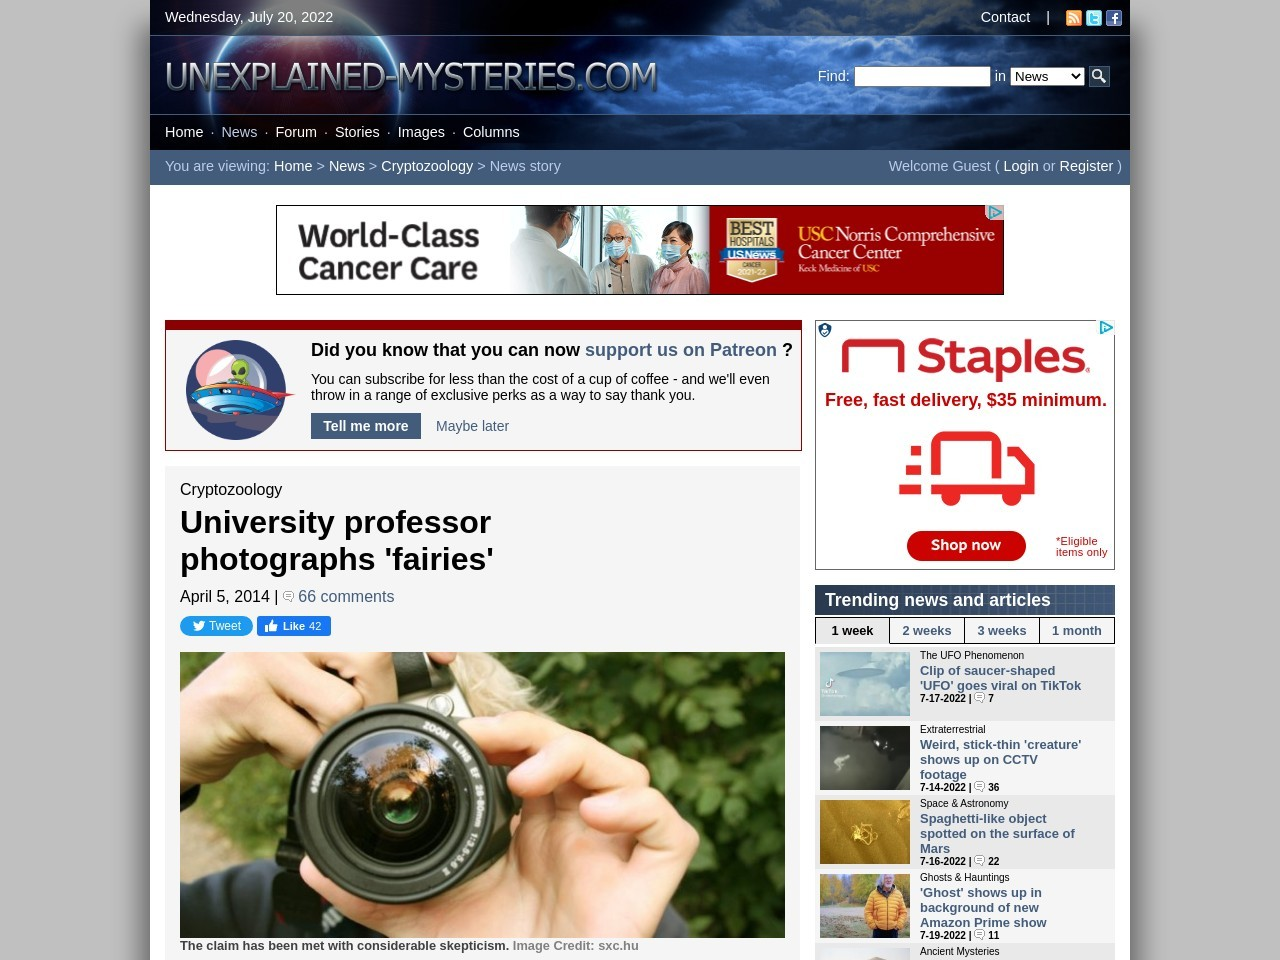 University professor photographs 'fairies'